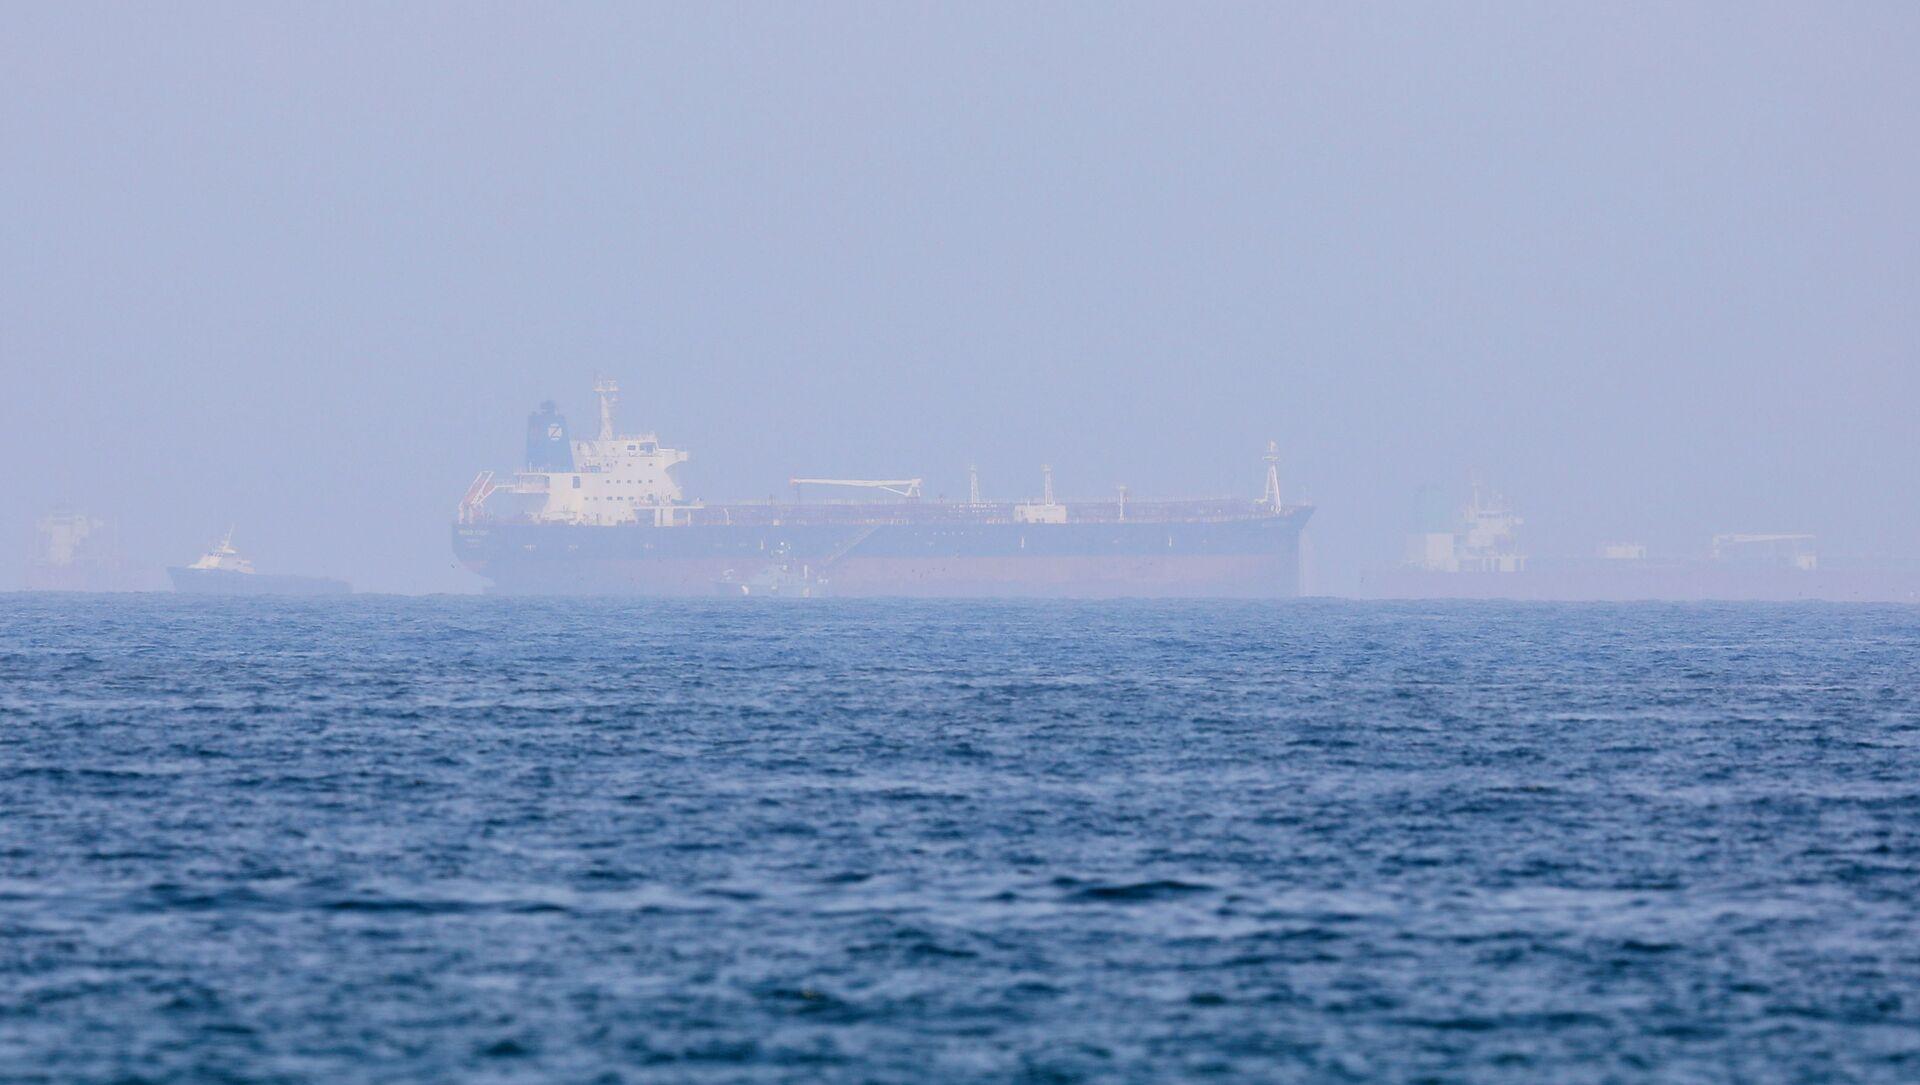 Mercer Street, an Israeli-managed oil tanker that was attacked is seen off Fujairah Port in United Arab Emirates, August 3, 2021. REUTERS/Rula Rouhana - Sputnik International, 1920, 03.08.2021